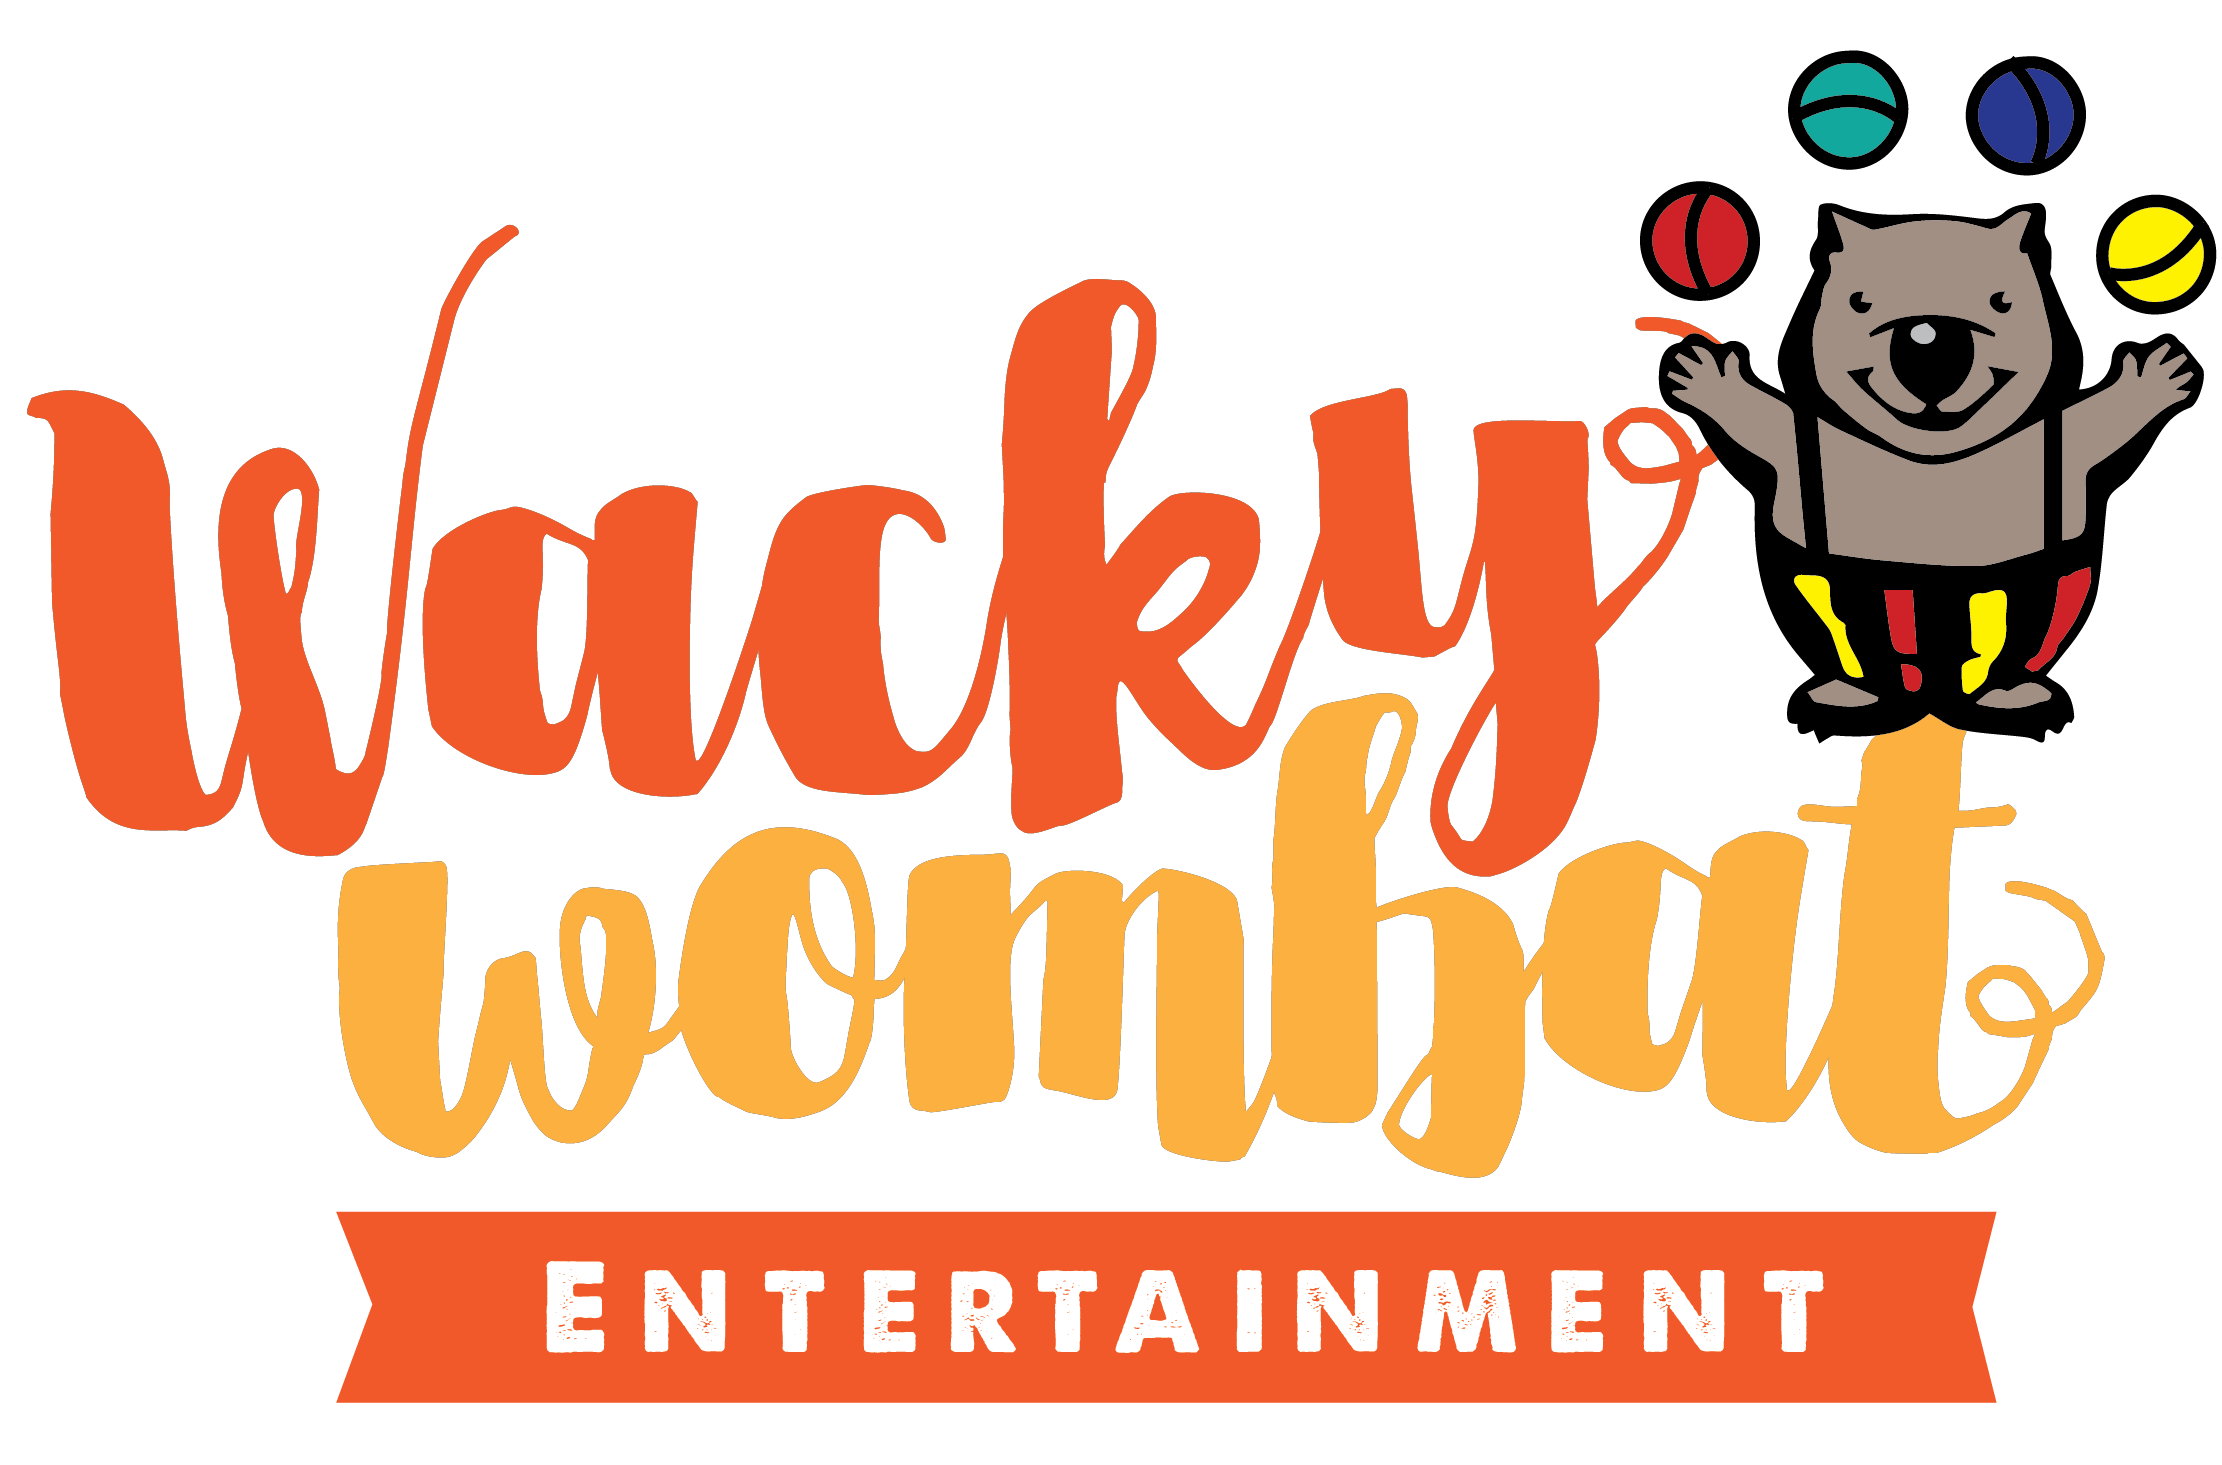 Wacky Wombat Entertainment